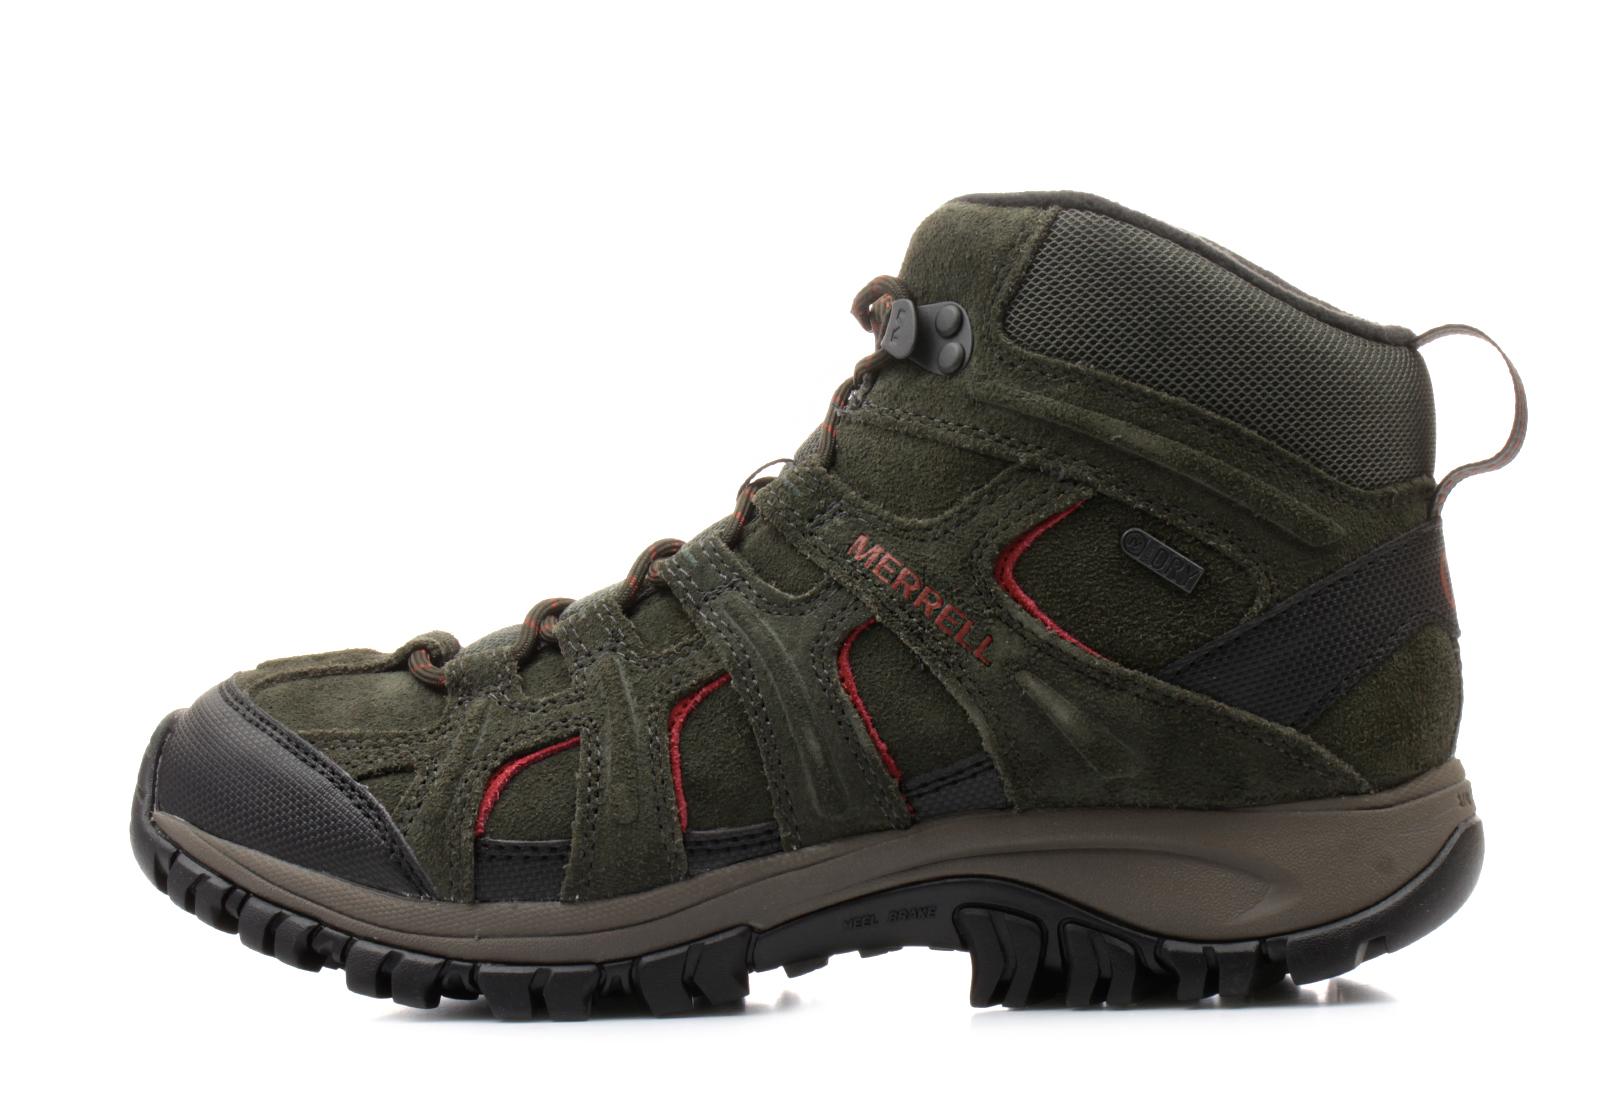 b5dd6ba907 Merrell Bakancs - Phoenix 2 Mid Thermo - J09603-gry - Office Shoes ...